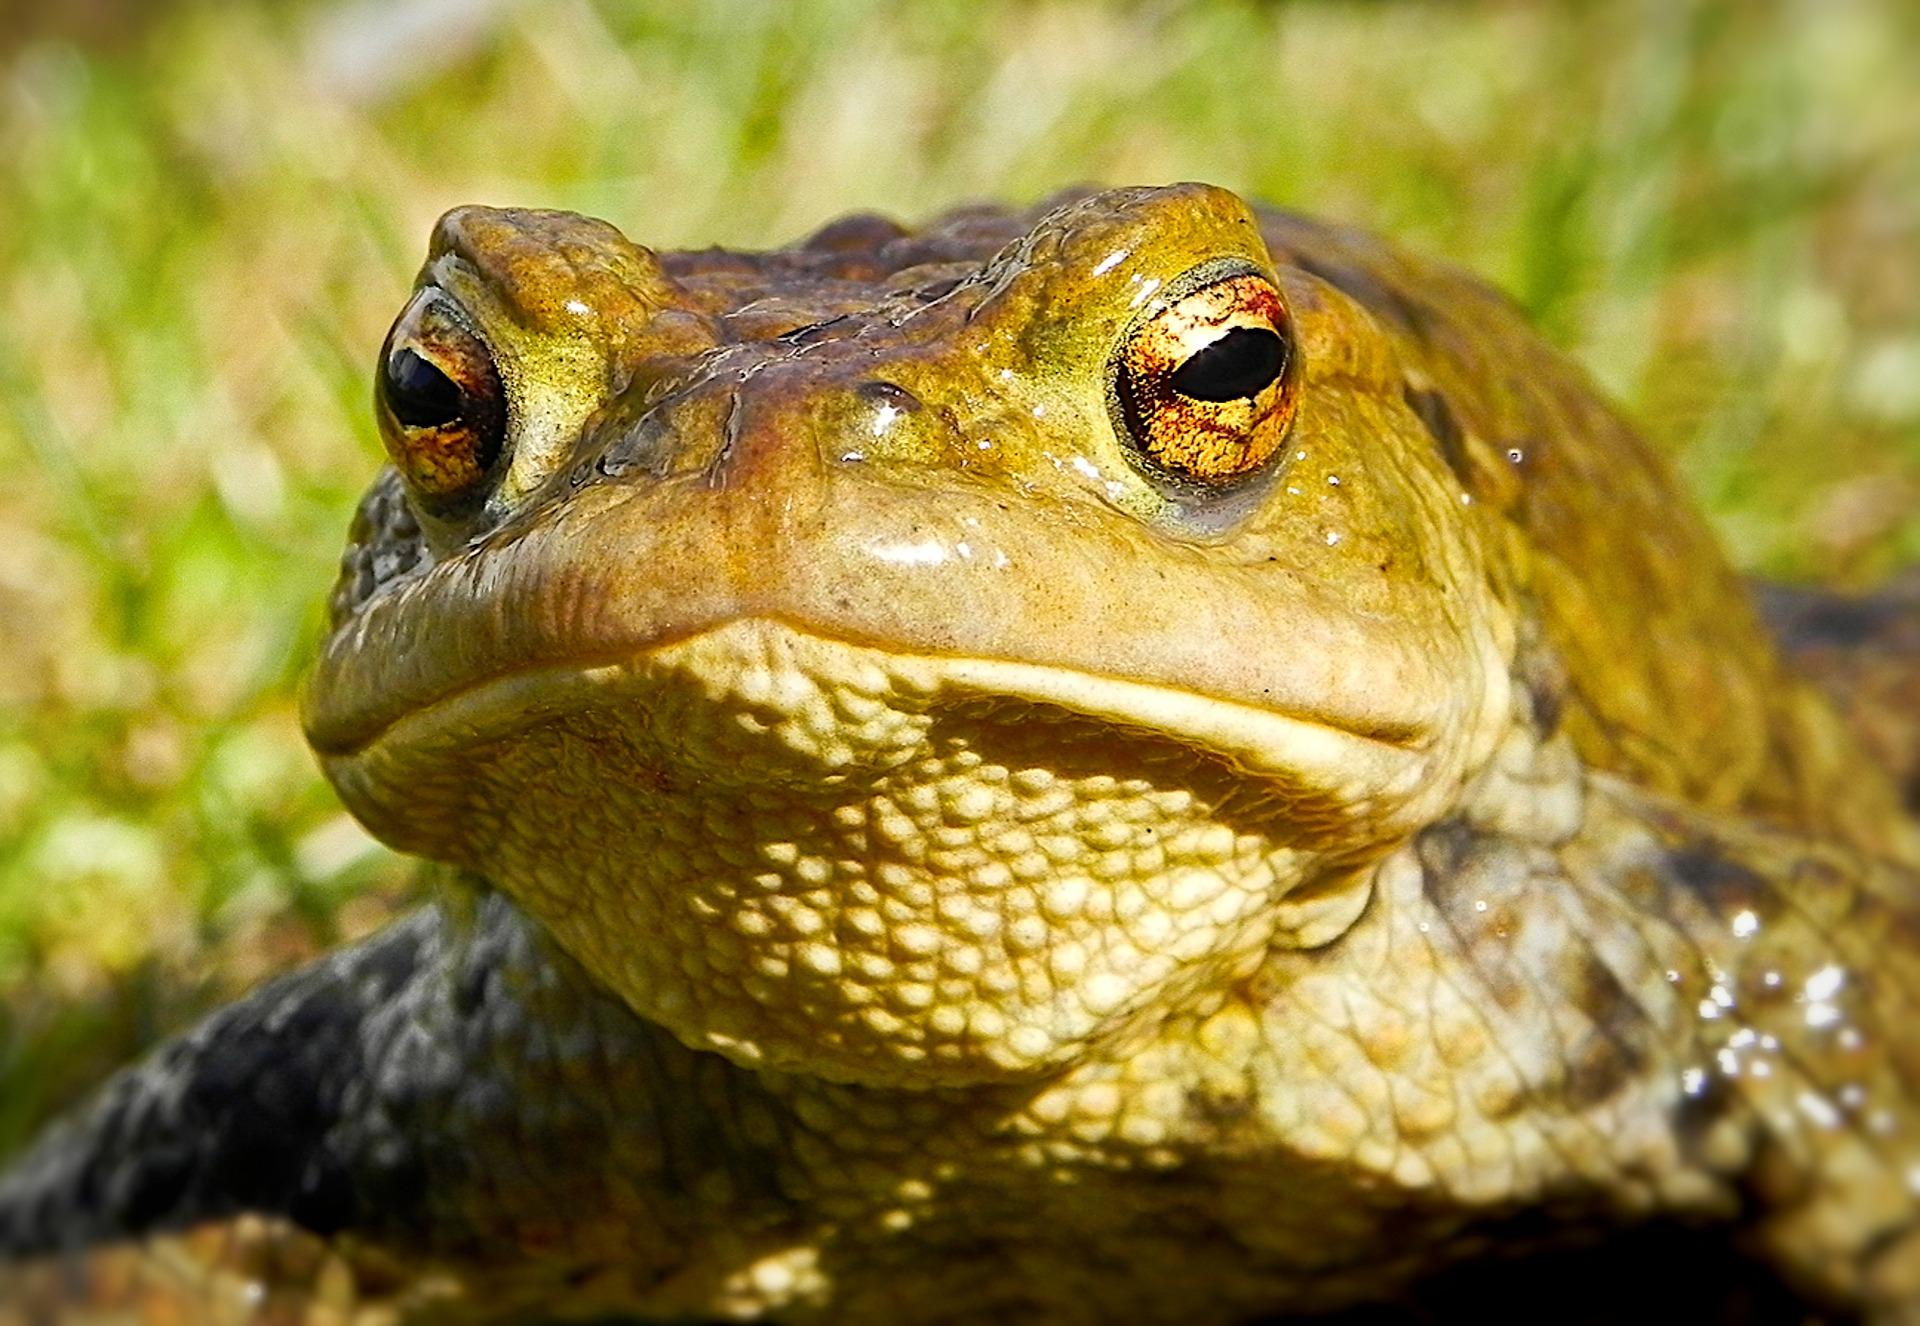 frog-1729430_1920